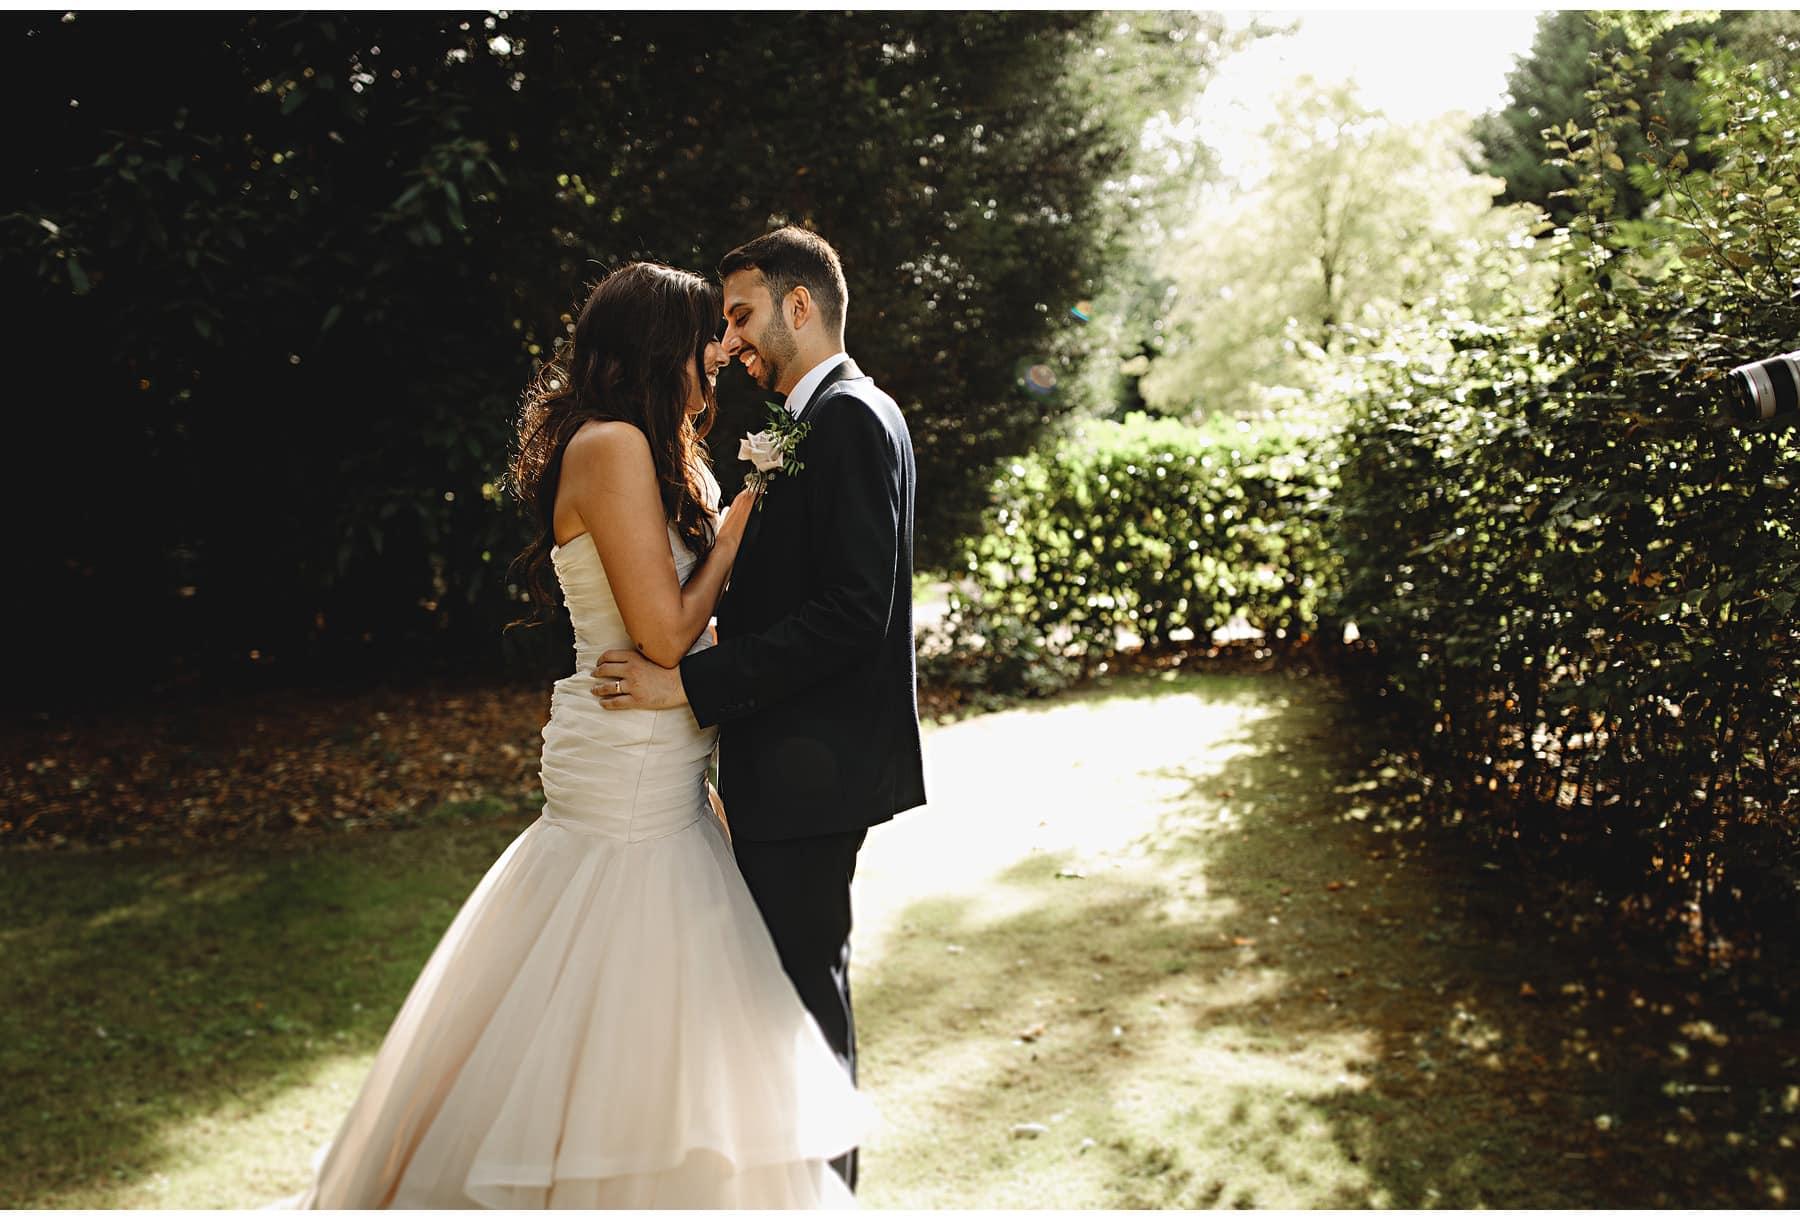 the bride & groom in the sun